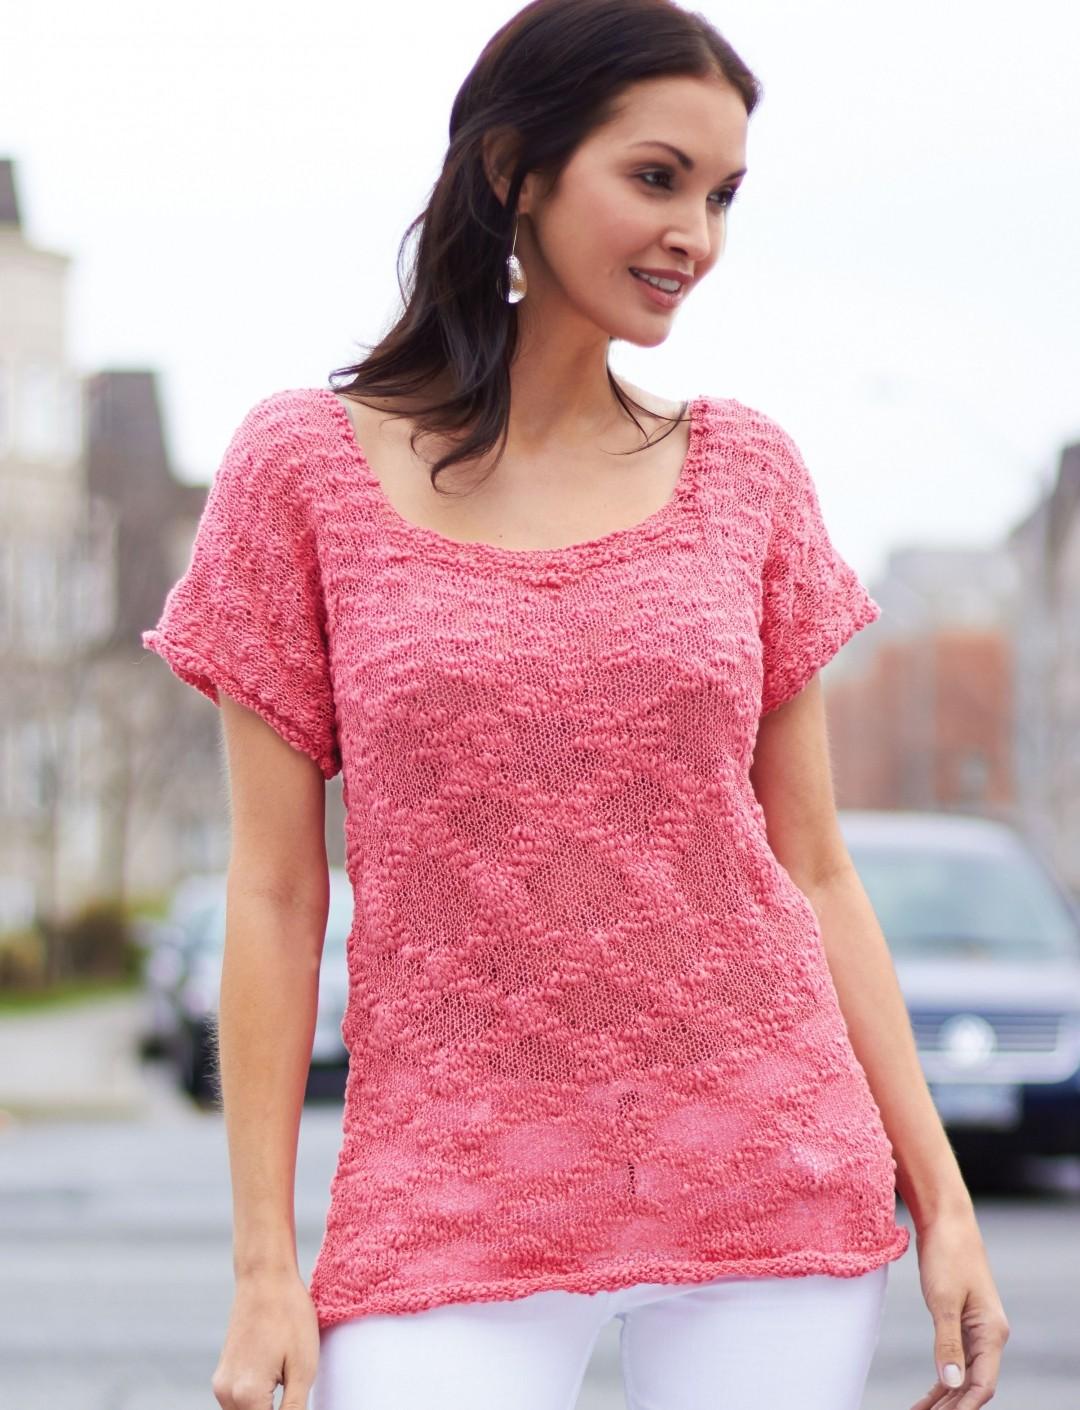 Tops, Tanks, Tees Knitting Patterns - In the Loop Knitting